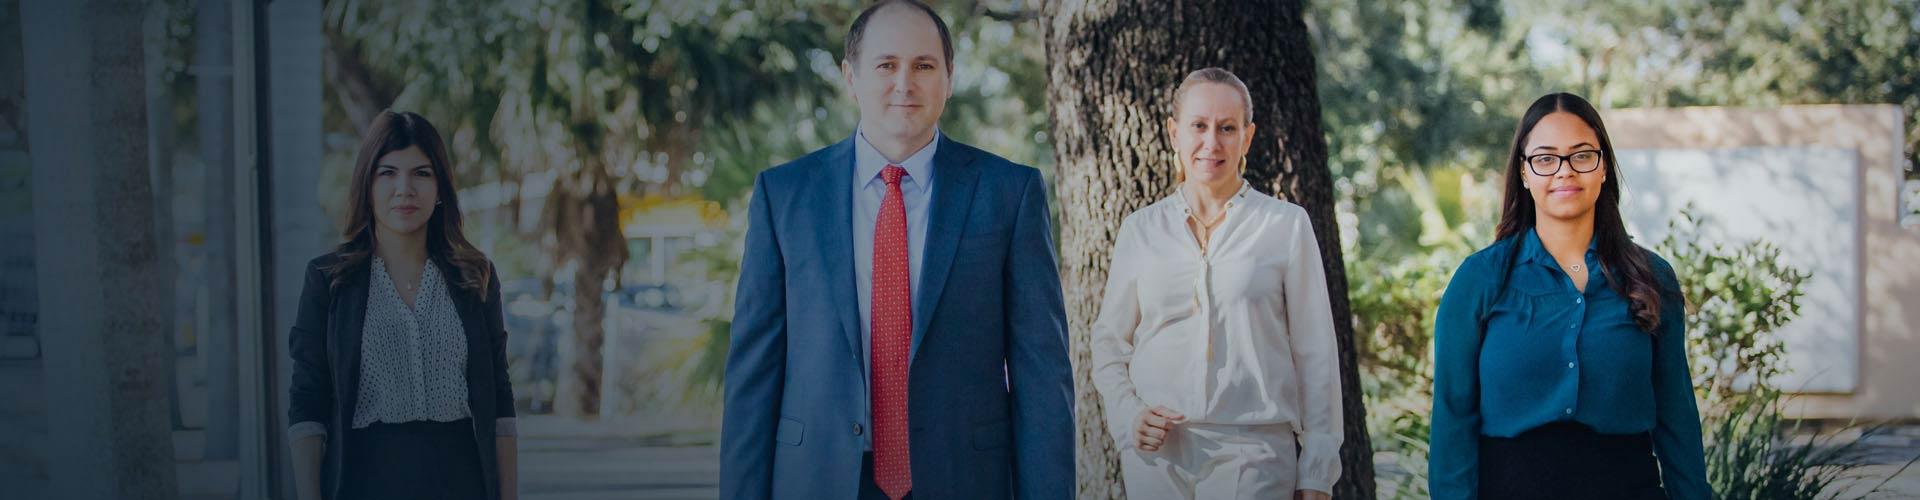 Student Loan Attorneys - Stiberman Law Firm